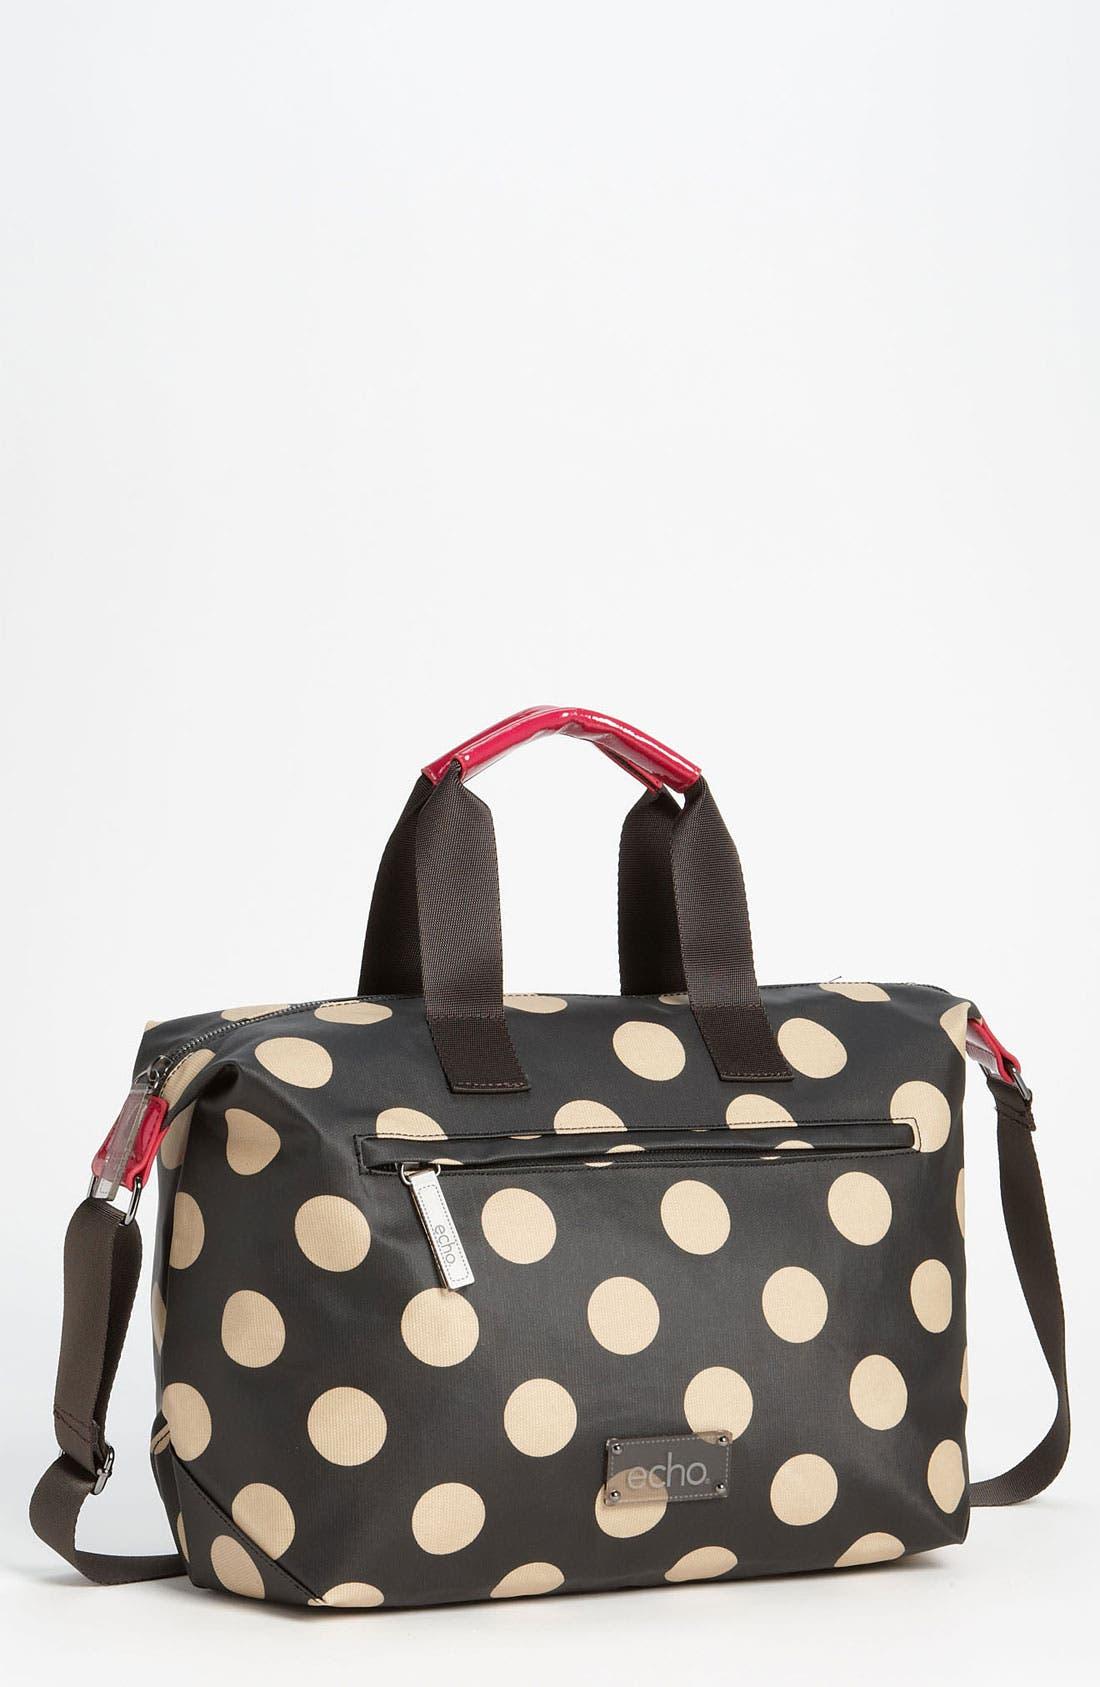 Main Image - Echo 'Vintage - Medium' Messenger Bag